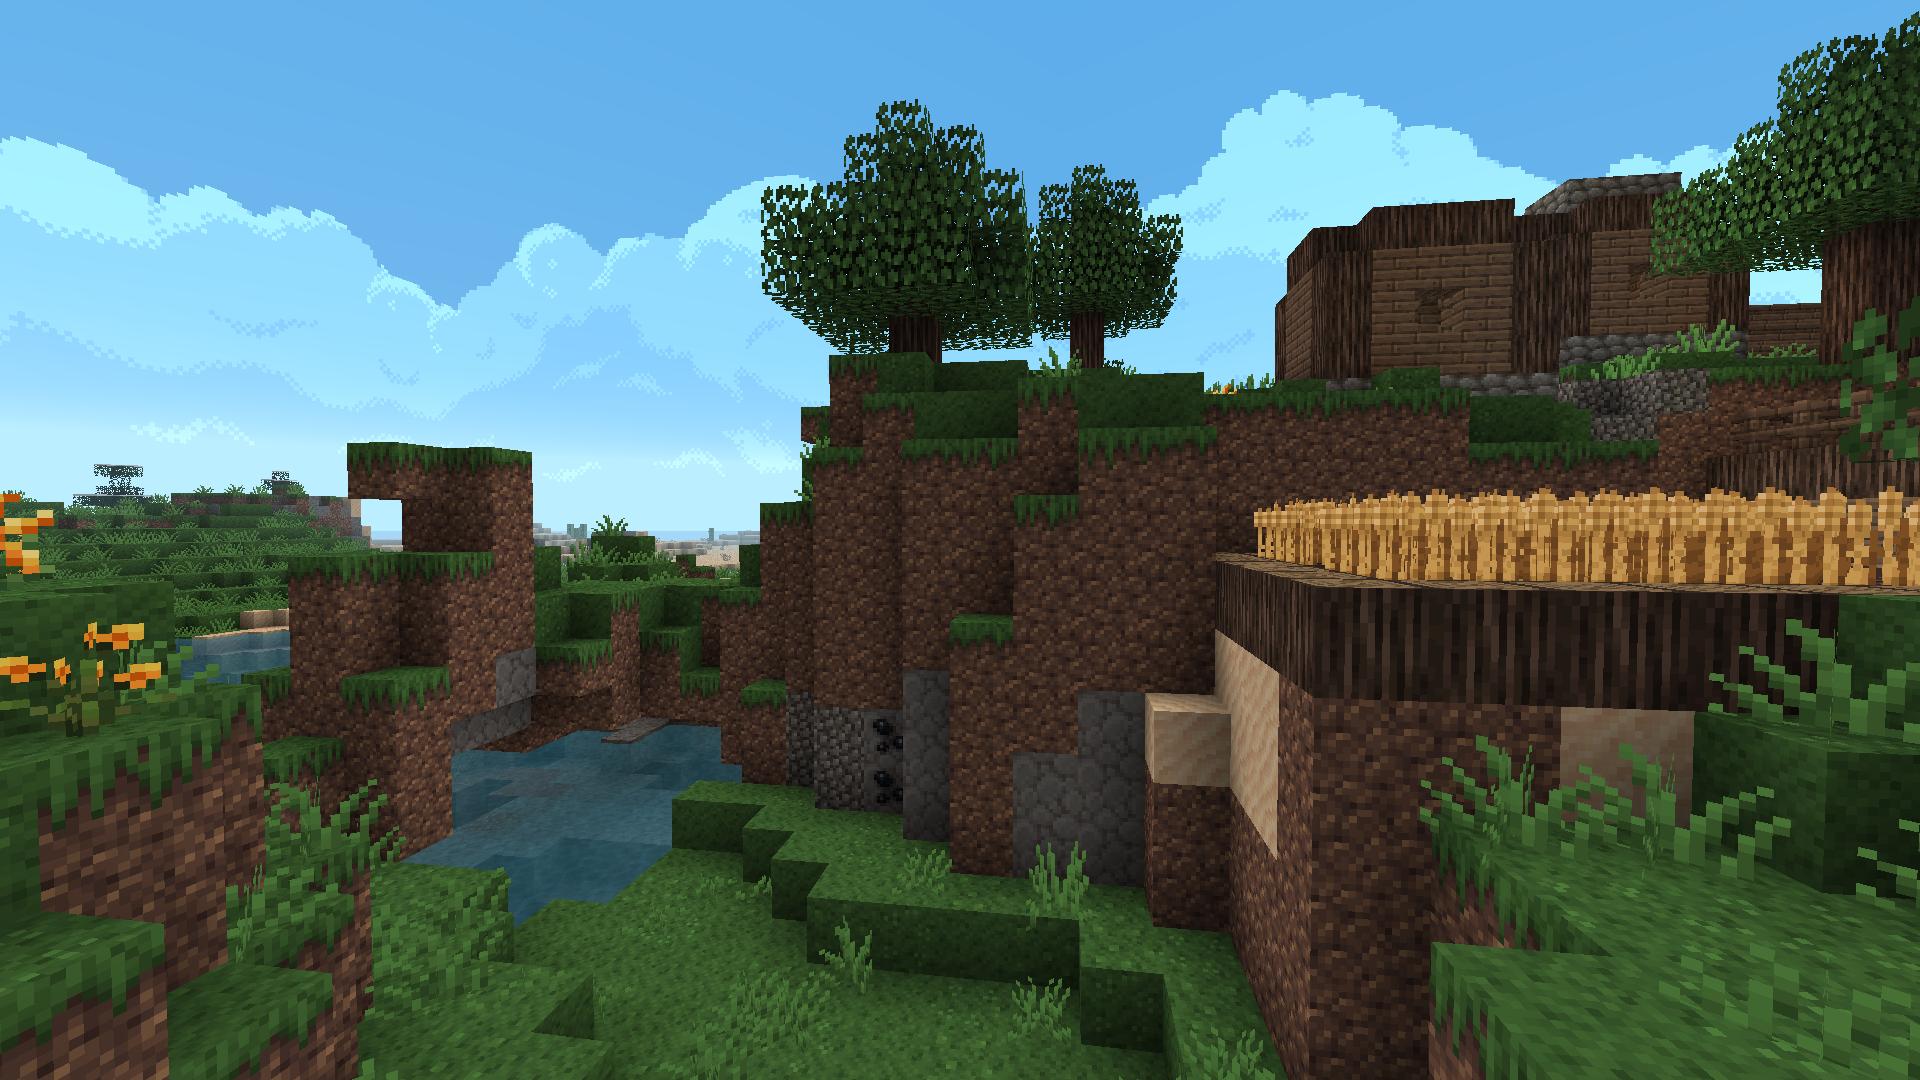 Pixel Perfection Texture Pack for Minecraft 1.4.2 | Minecraft Forum